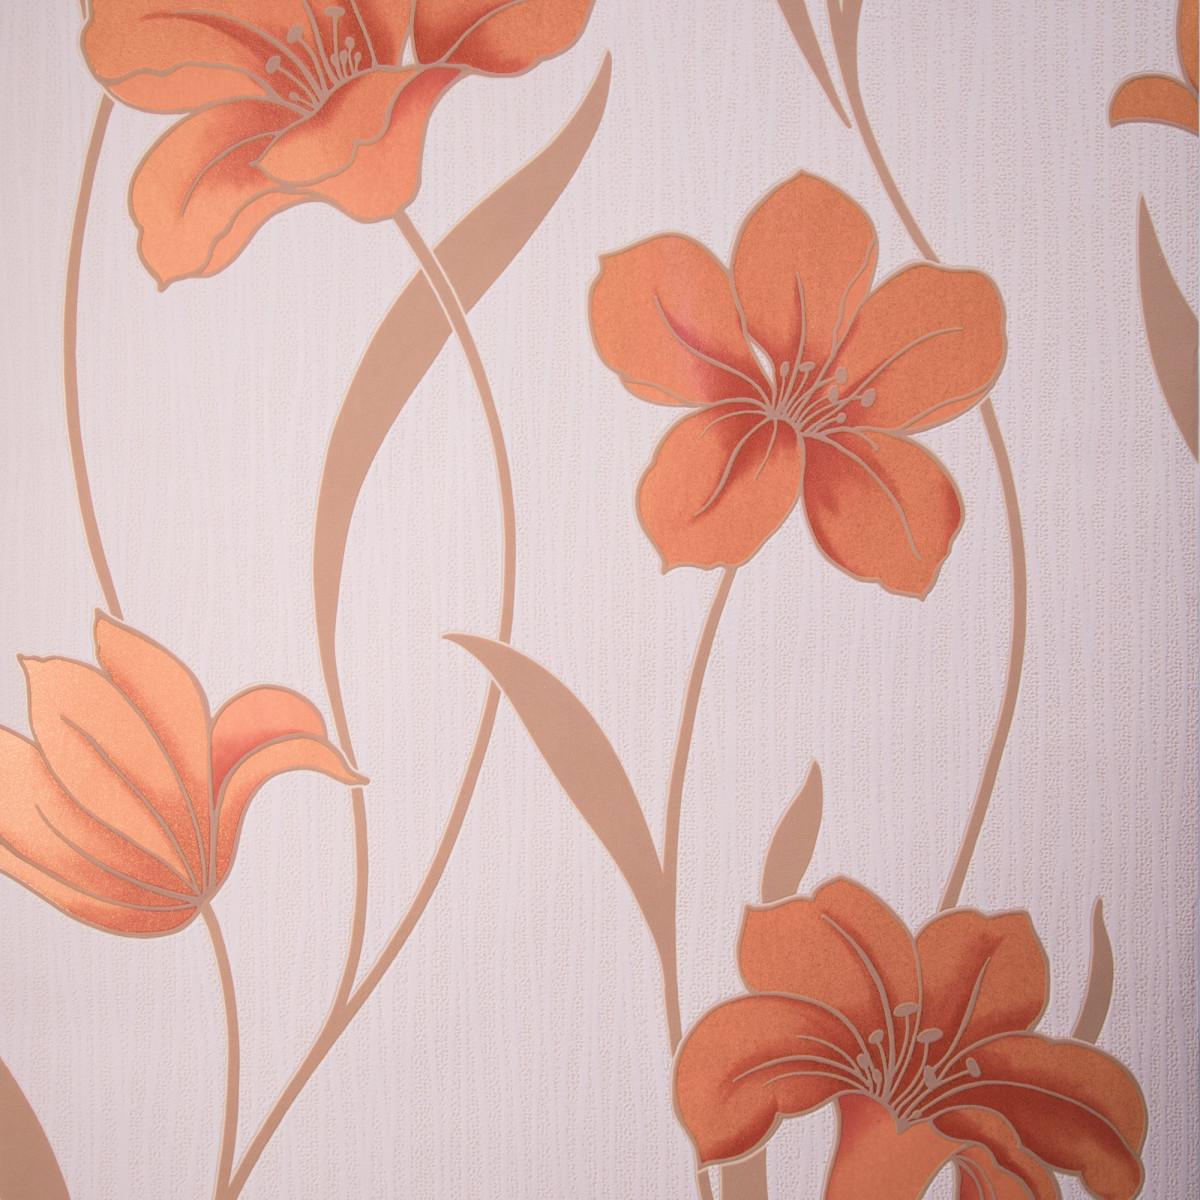 Обои виниловые 053х10 м цветы оранжевый Id-013-03-6